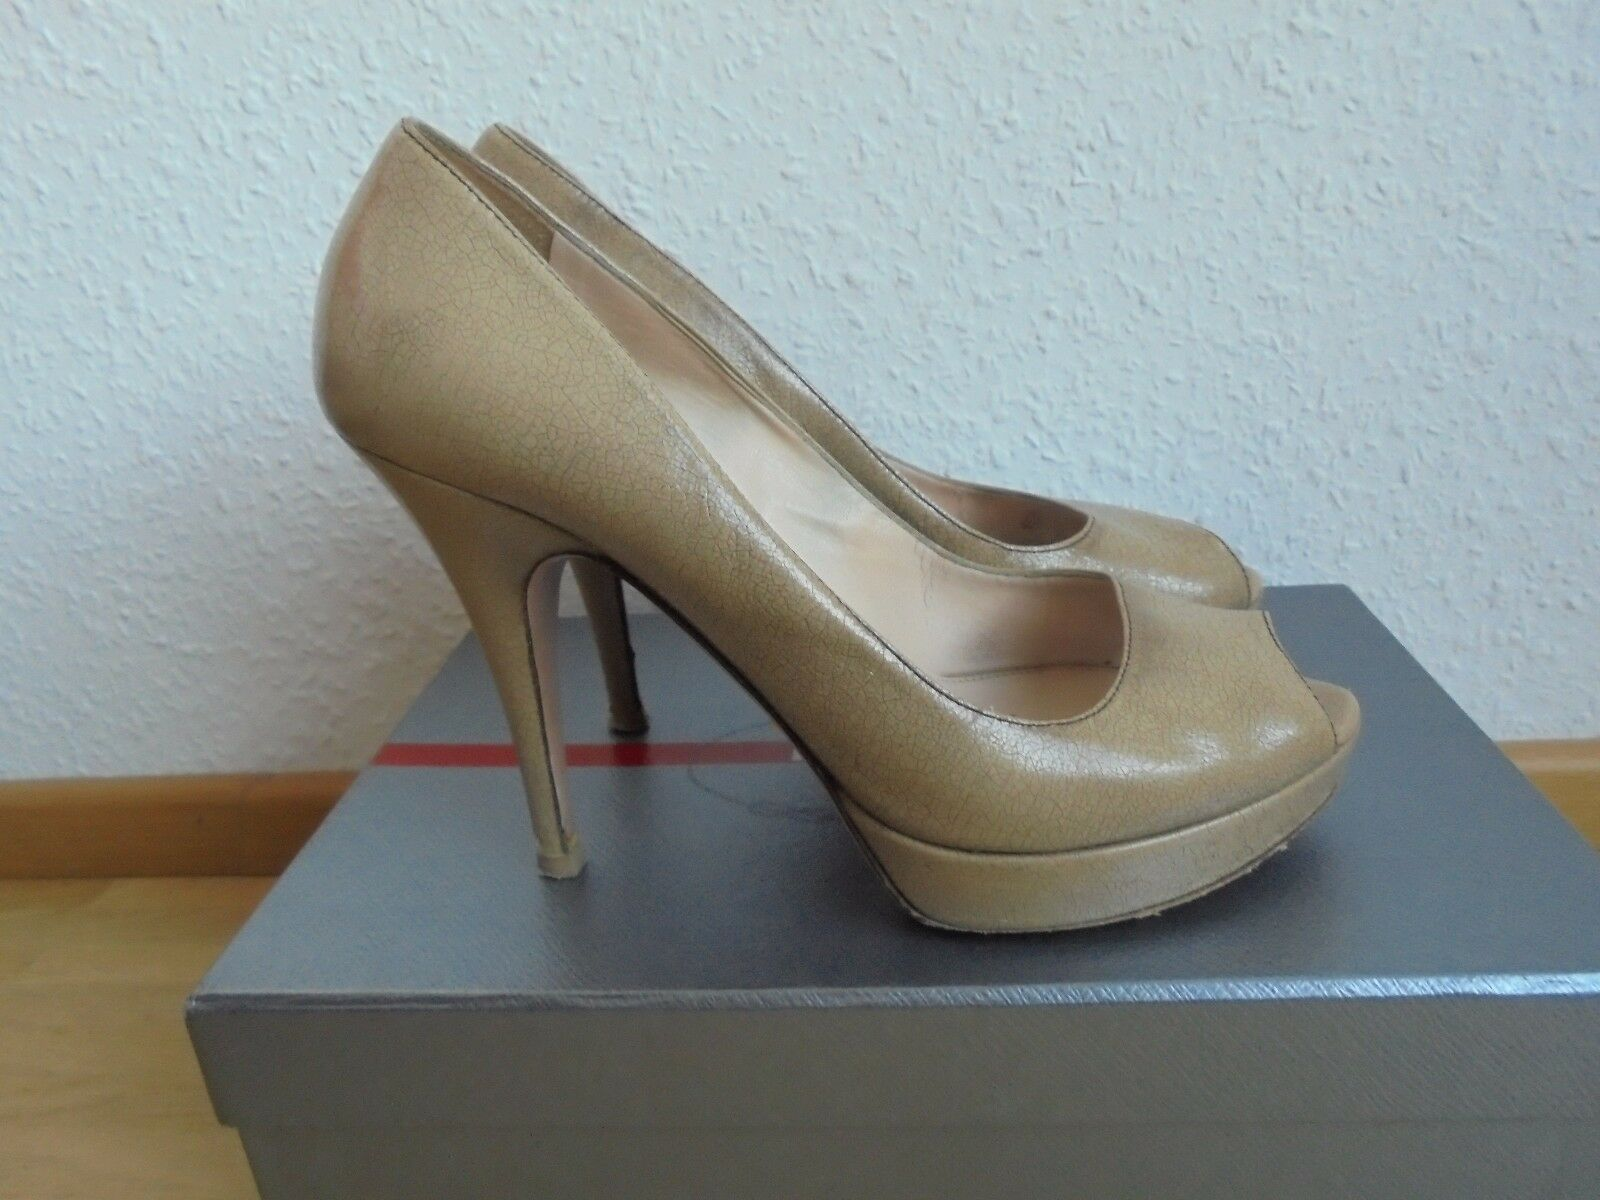 PRADA Nude Leder High OVP Heels NP:  + OVP High Pumps Designer Schuhe 38 38,5 39 d3711a